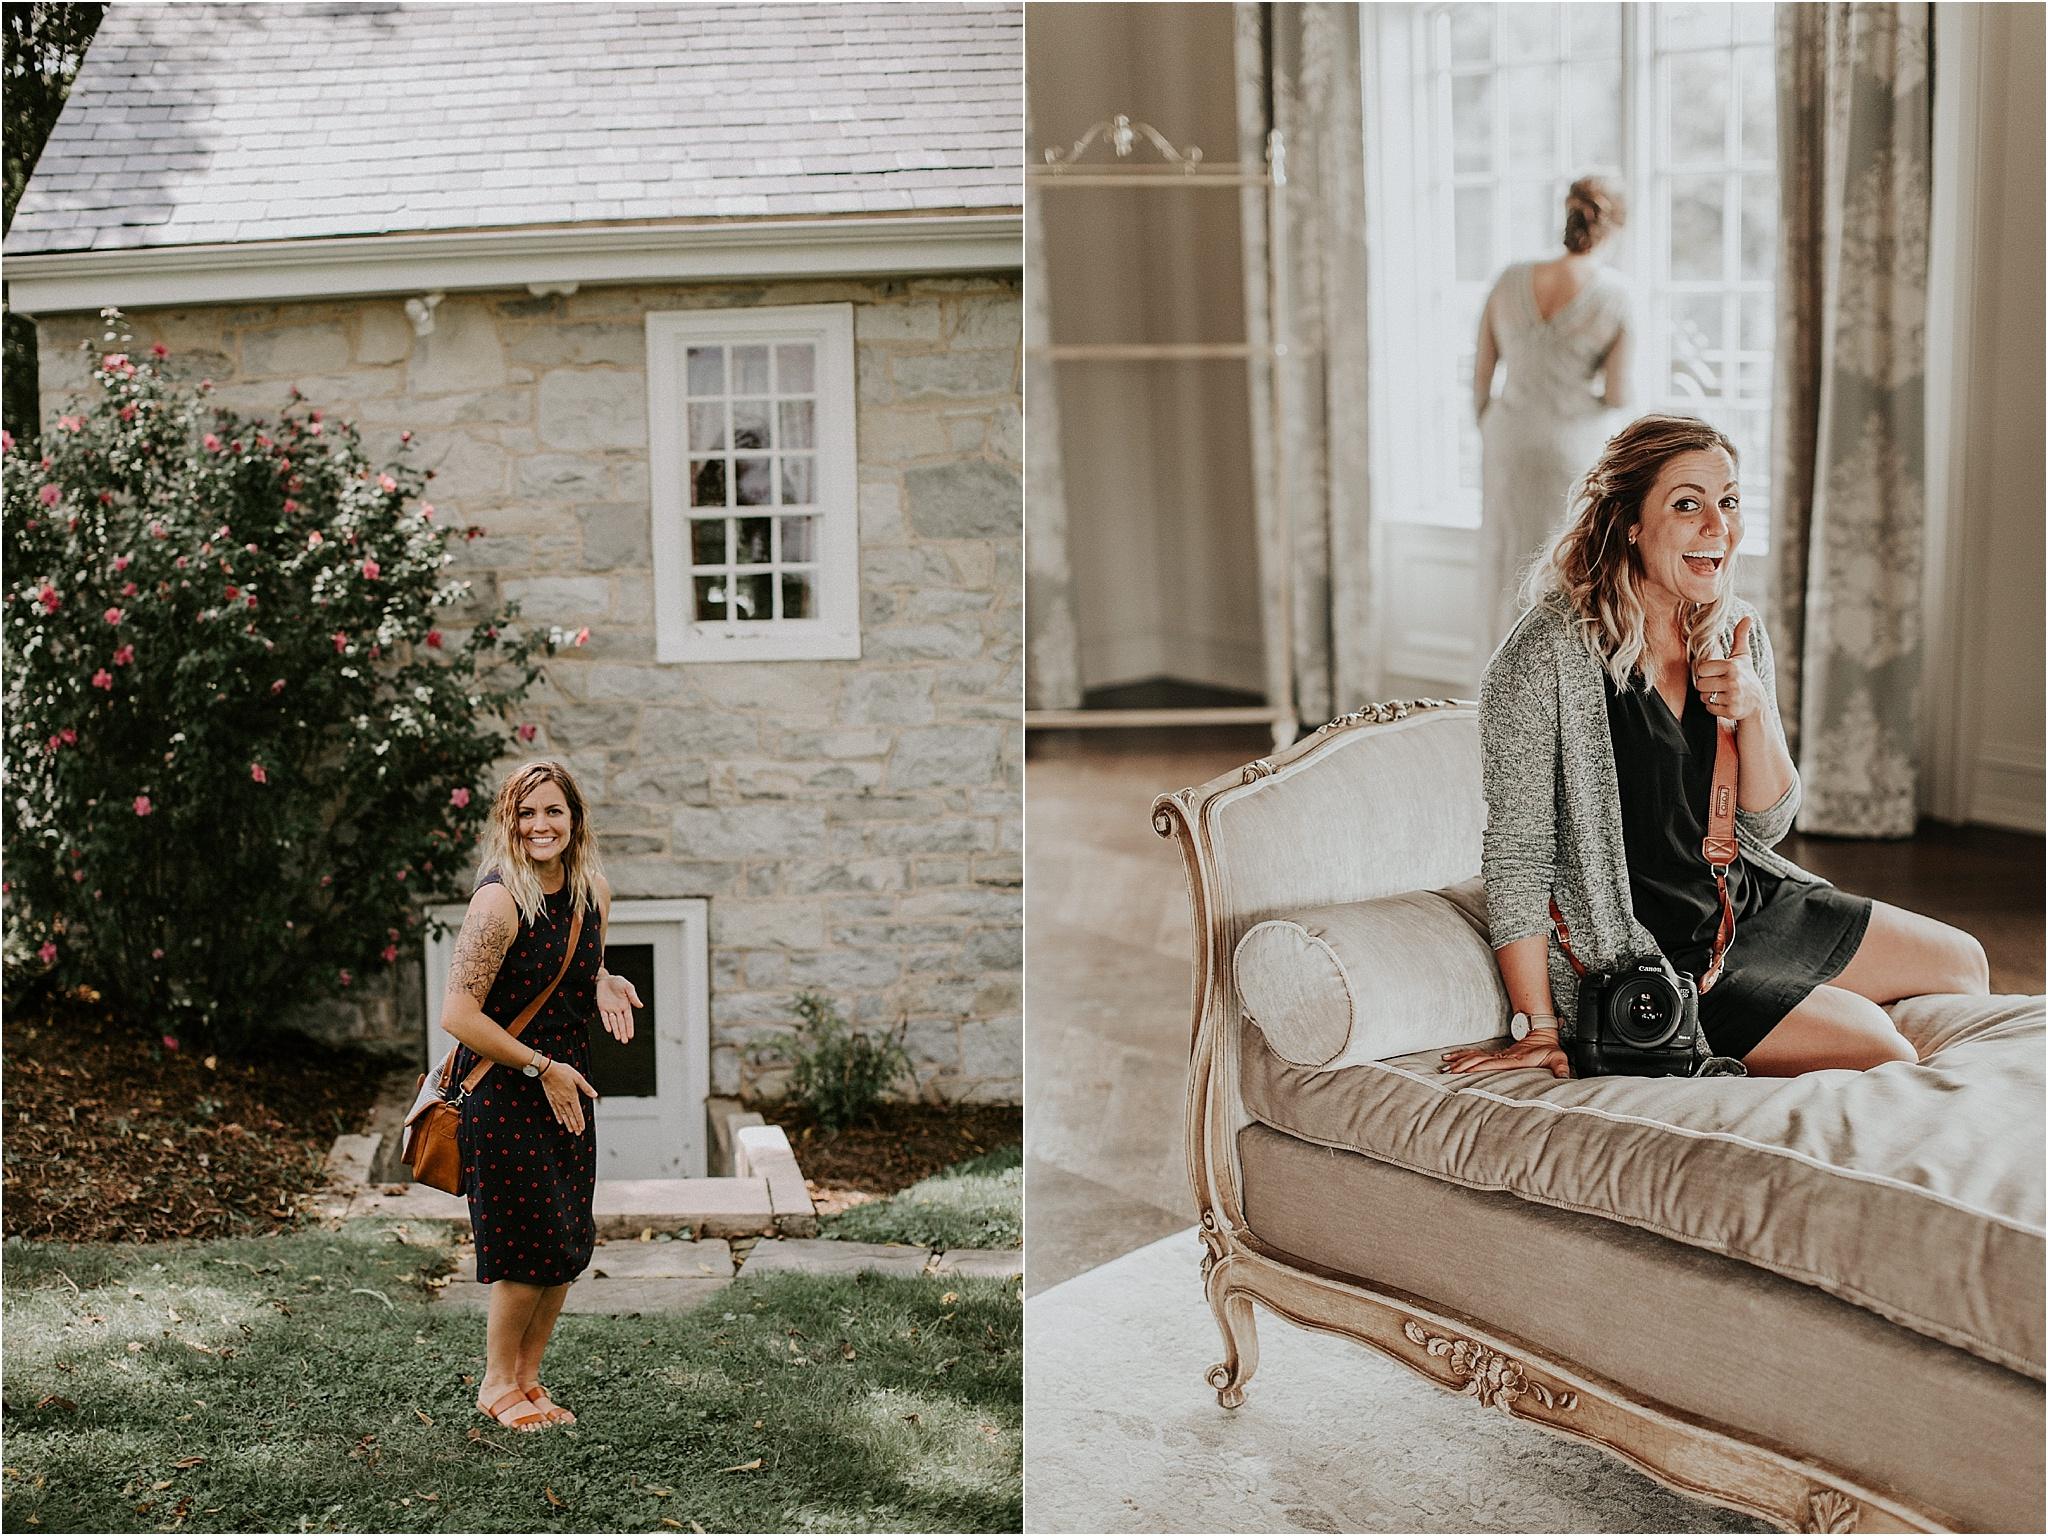 Sarah_Brookhart_PA_MD_Wedding_Photographer_0007.jpg